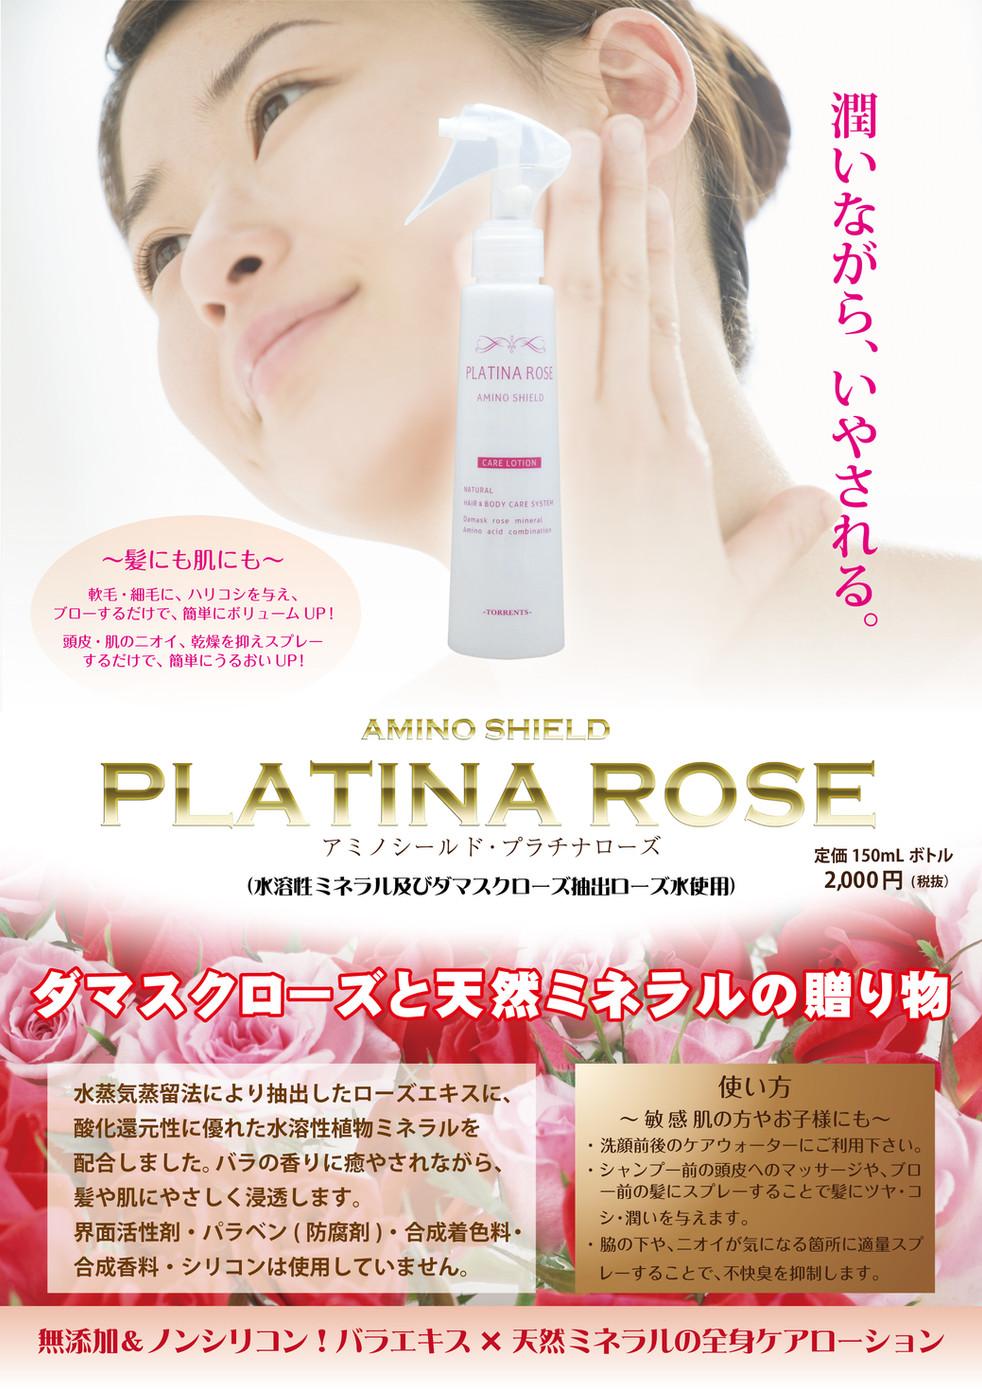 A4_PRATINA-ROSE.jpg